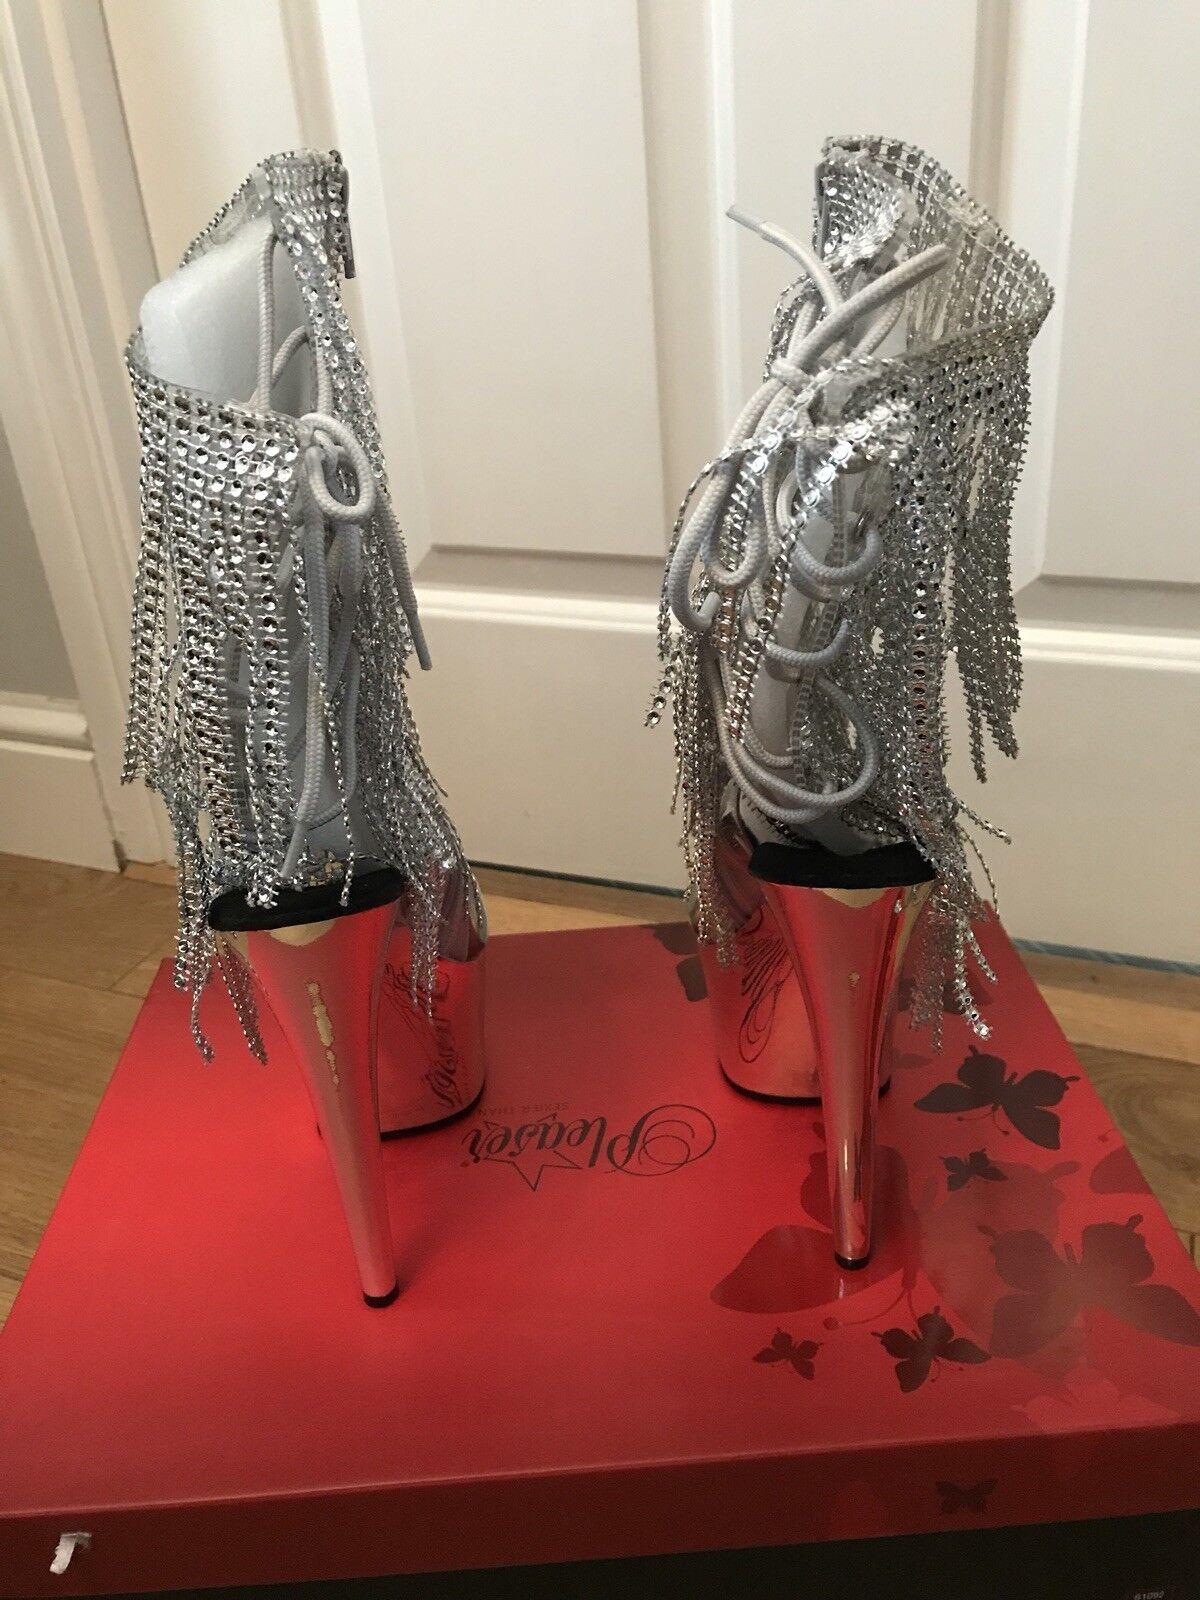 Pleaser Rhinestone Adore 1017RSF Sexy Silver Rhinestone Pleaser Ankle Stiefel UK Größe 5 New in Box 8e5954